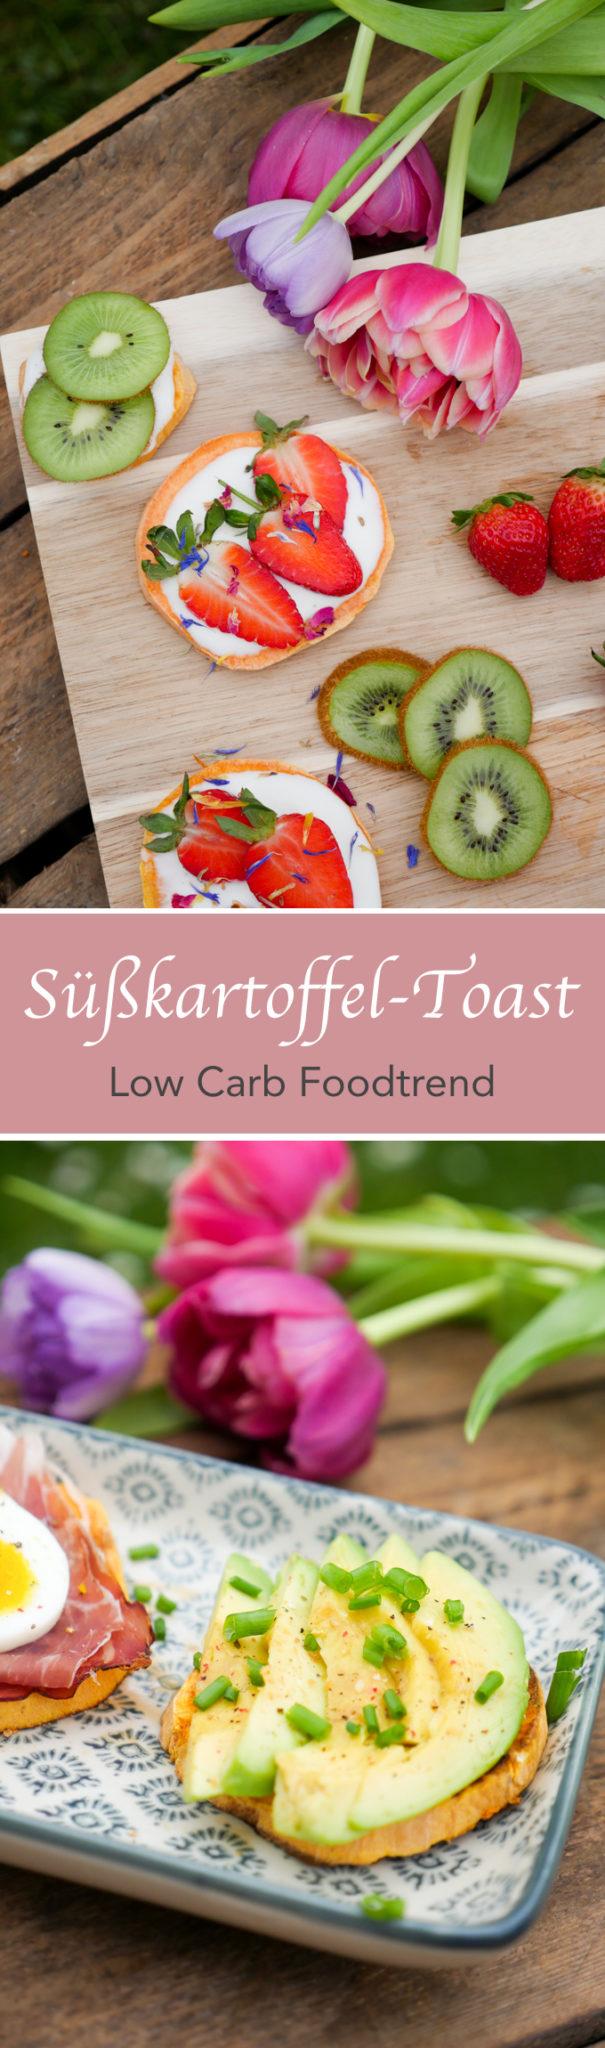 Low Carb Süßkartoffel-Toast herzhaft und süß - Foodtrend